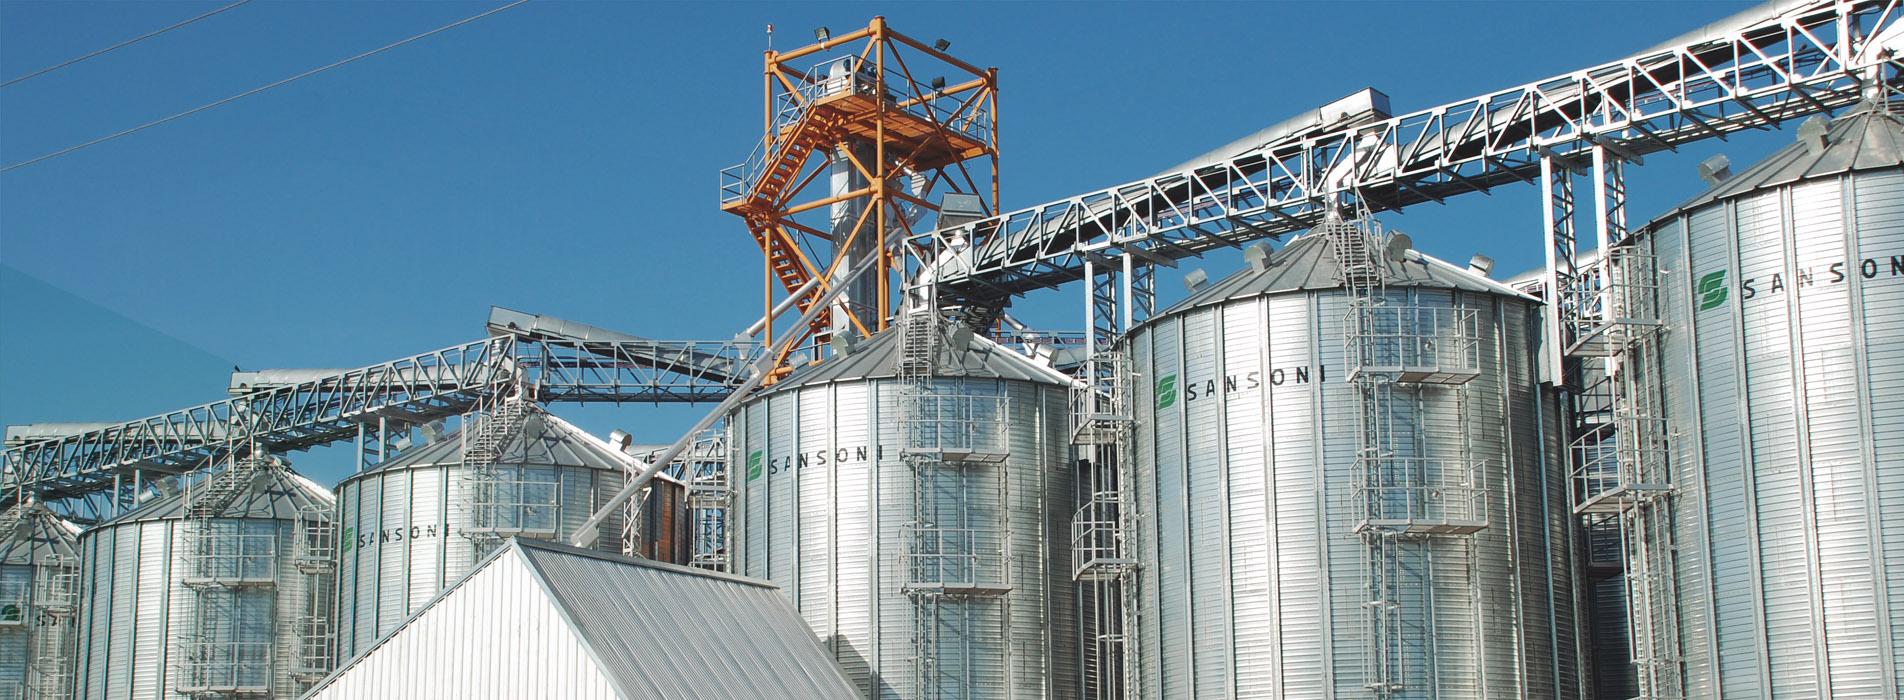 silos metalicos sansoni